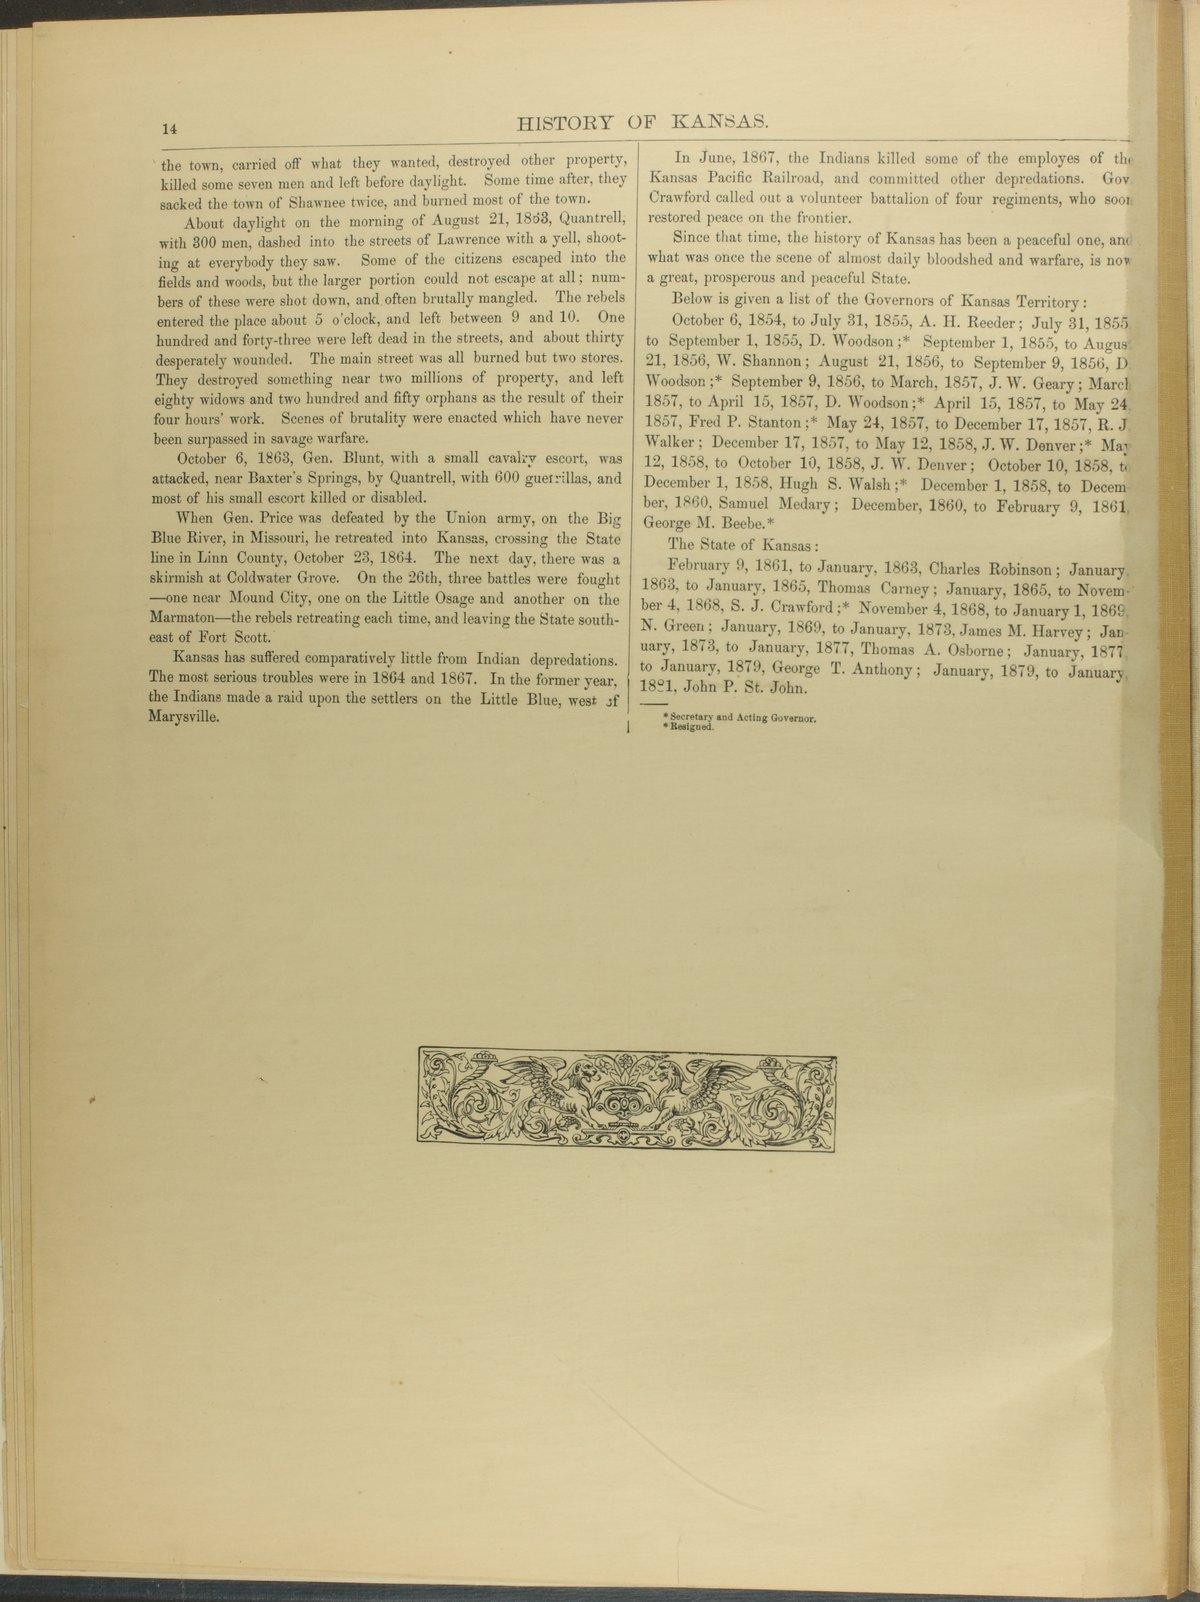 Historical plat book of Riley County, Kansas - 14